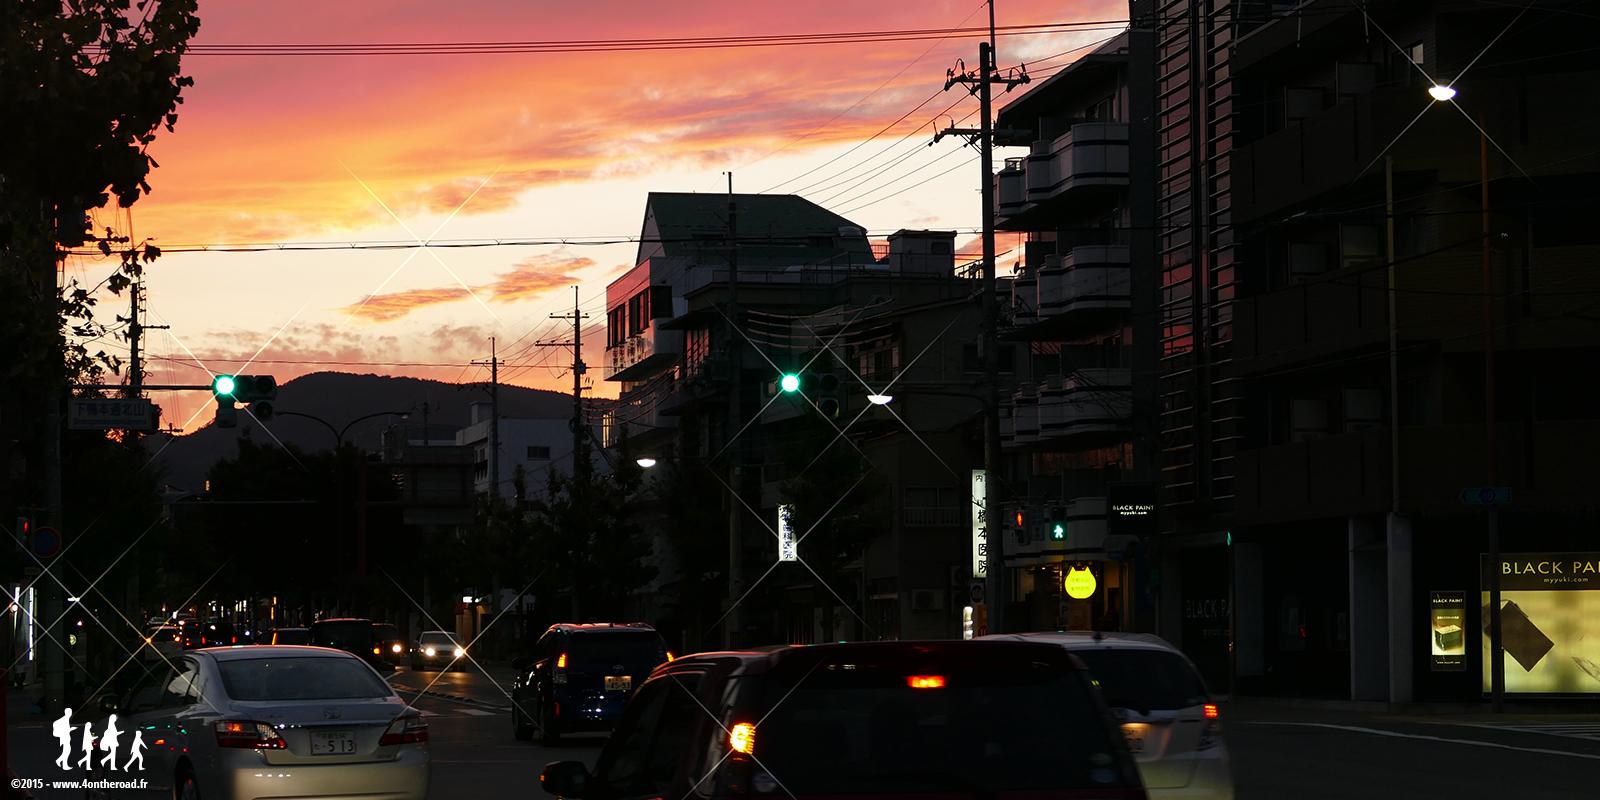 kyoto_003